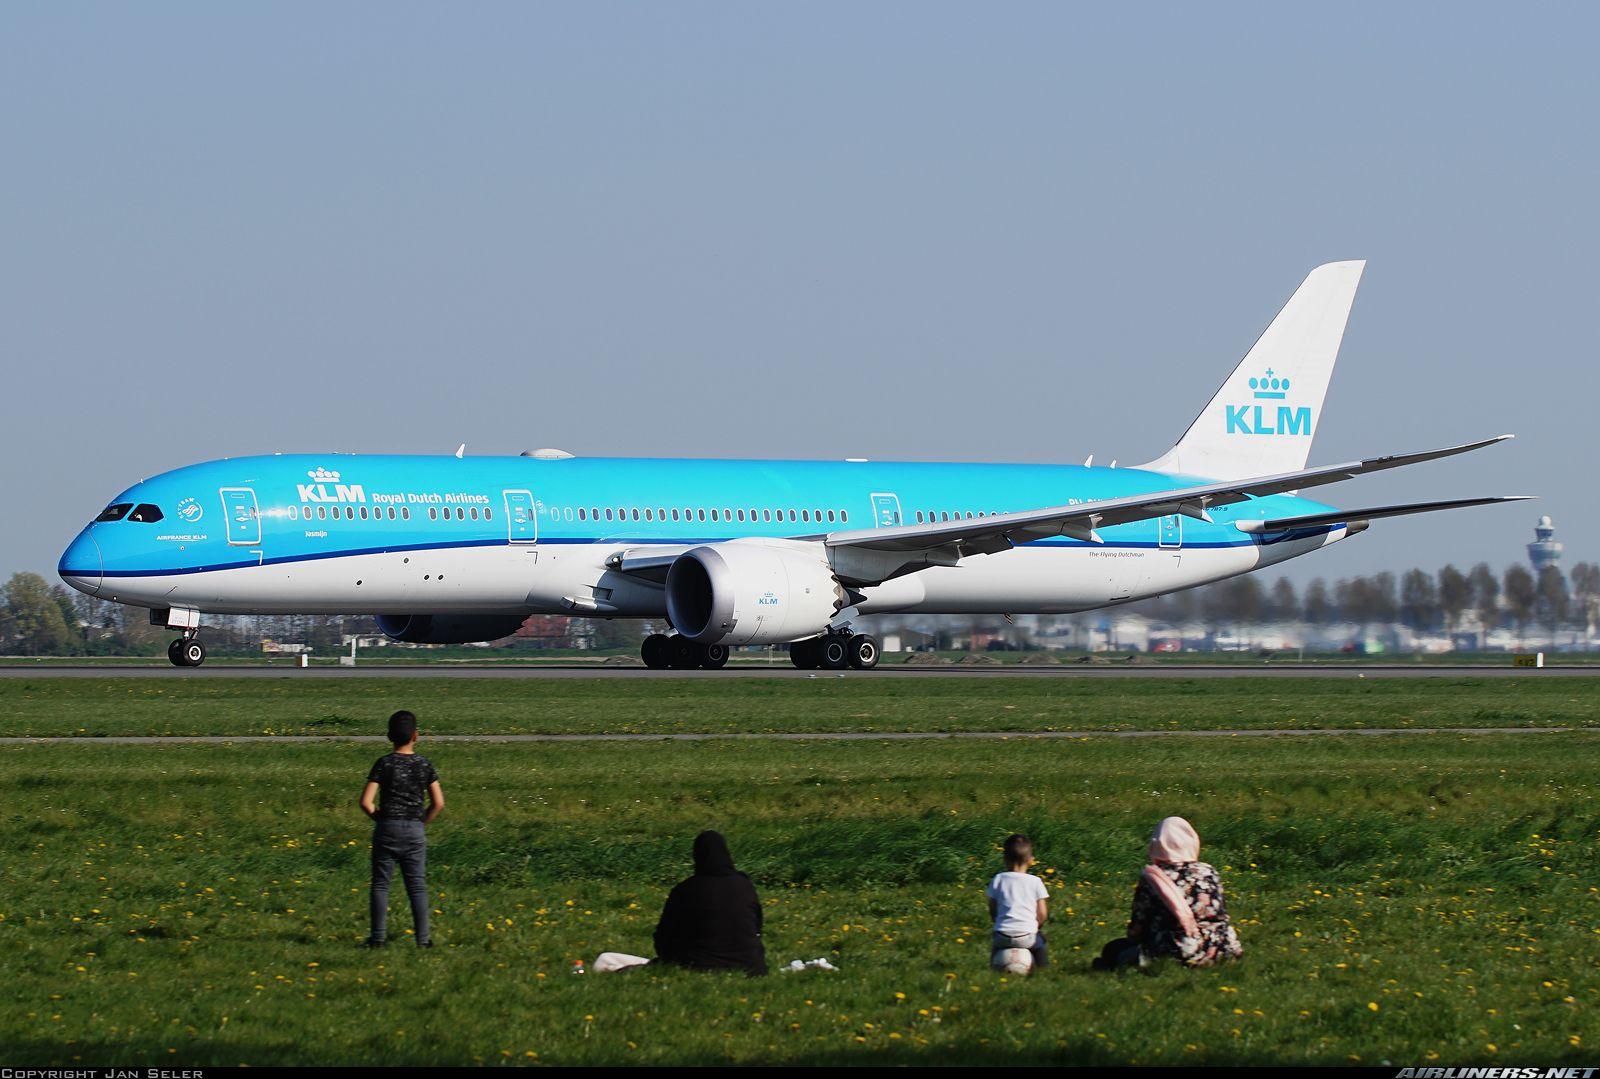 Photo Taken At Amsterdam Schiphol Ams Eham In Netherlands On April 19 2019 Klm Royal Dutch Airlines Boeing 787 9 Dreamliner Boeing Aircraft